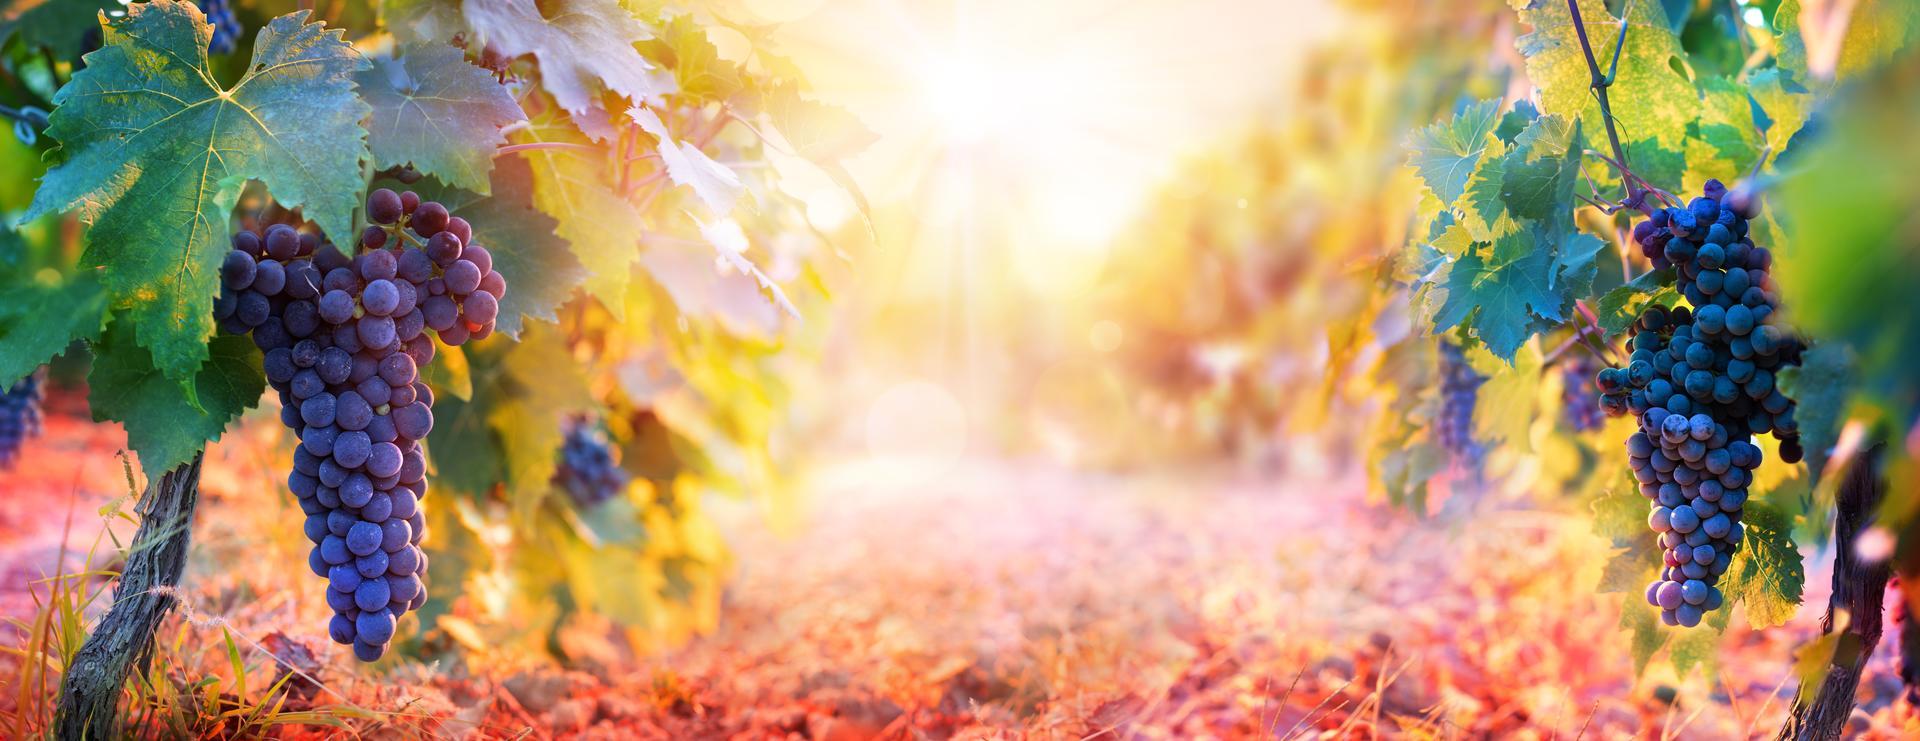 grapes-fall-winery-vineyard